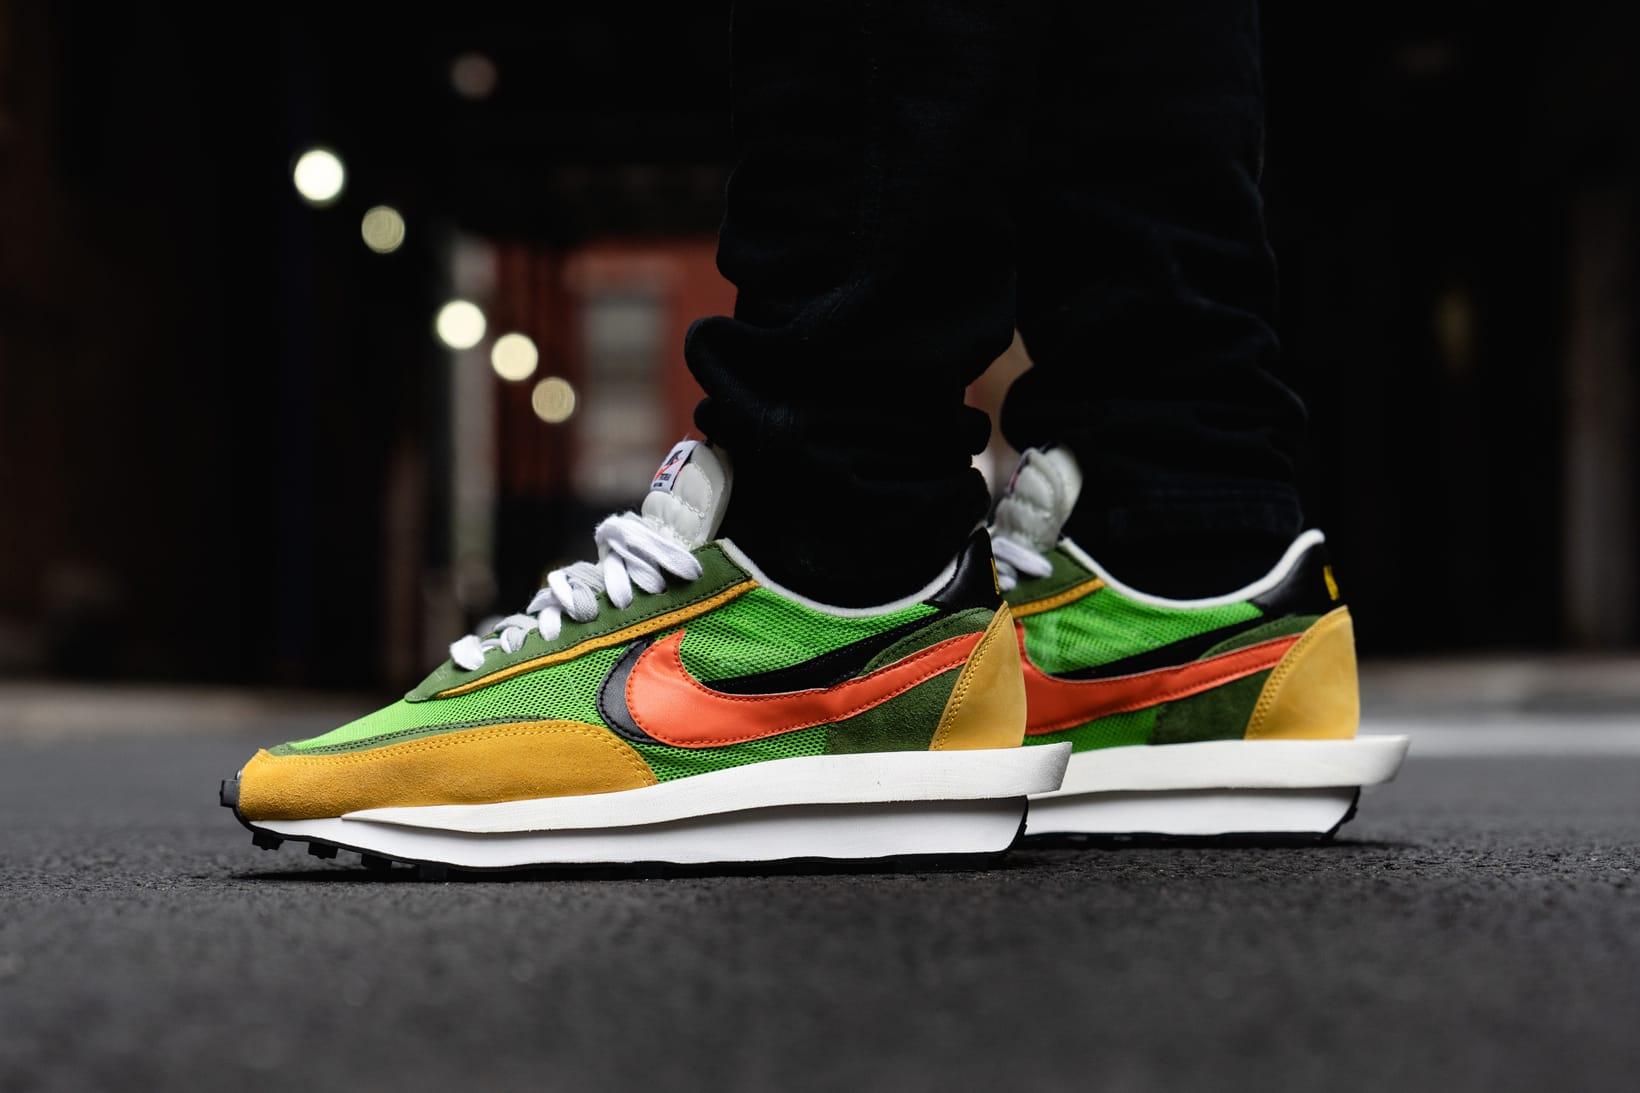 sacai x Nike LDWaffle Daybreak On Foot